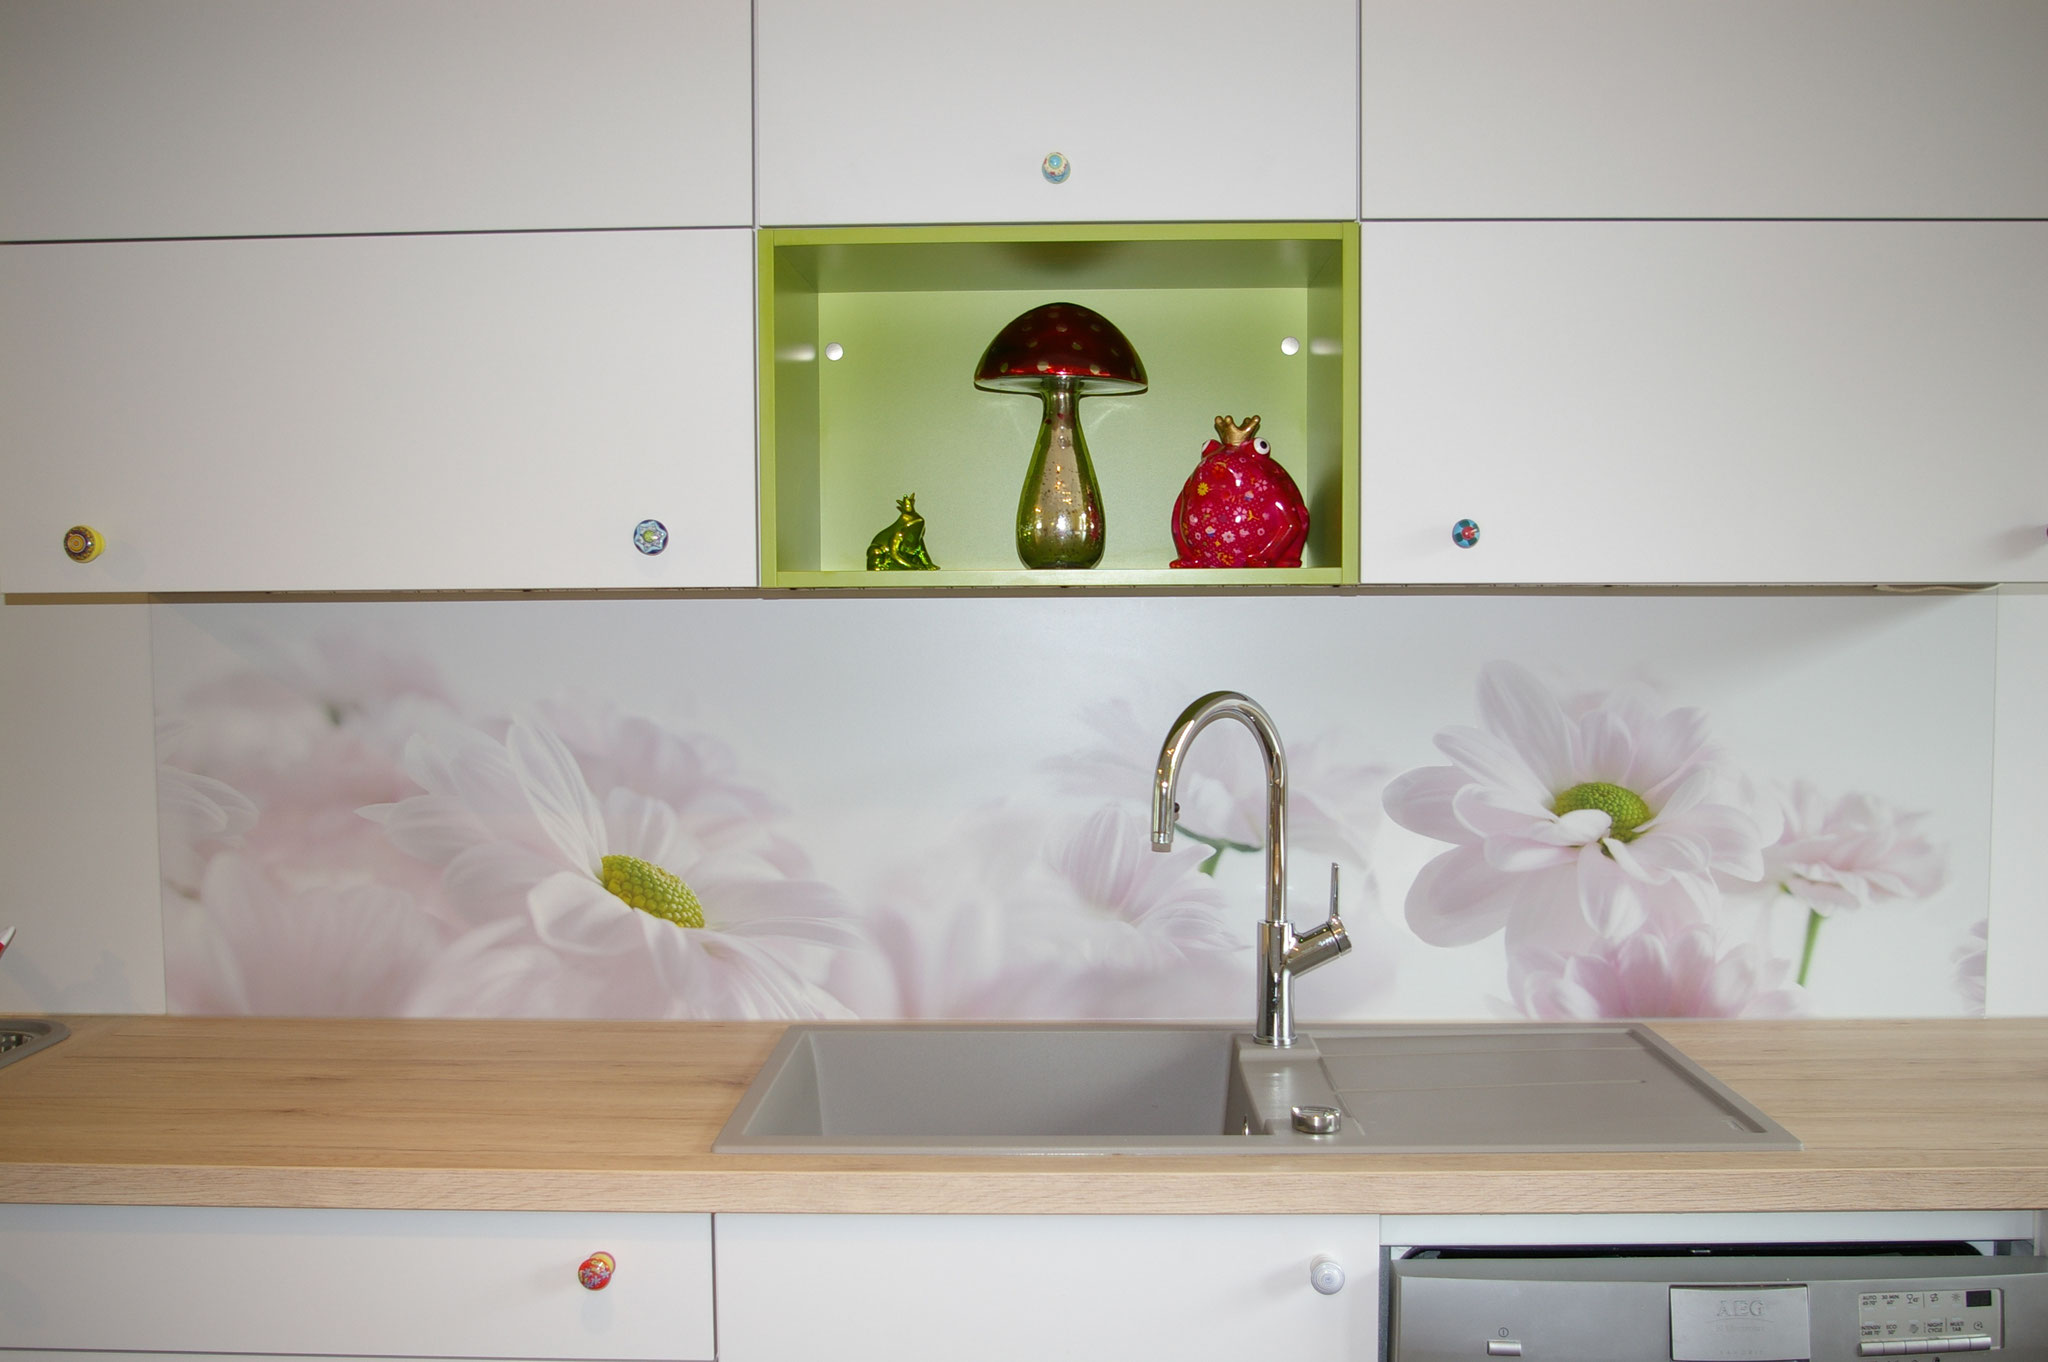 Küche mieten - Lecker Überleben Kochkurse